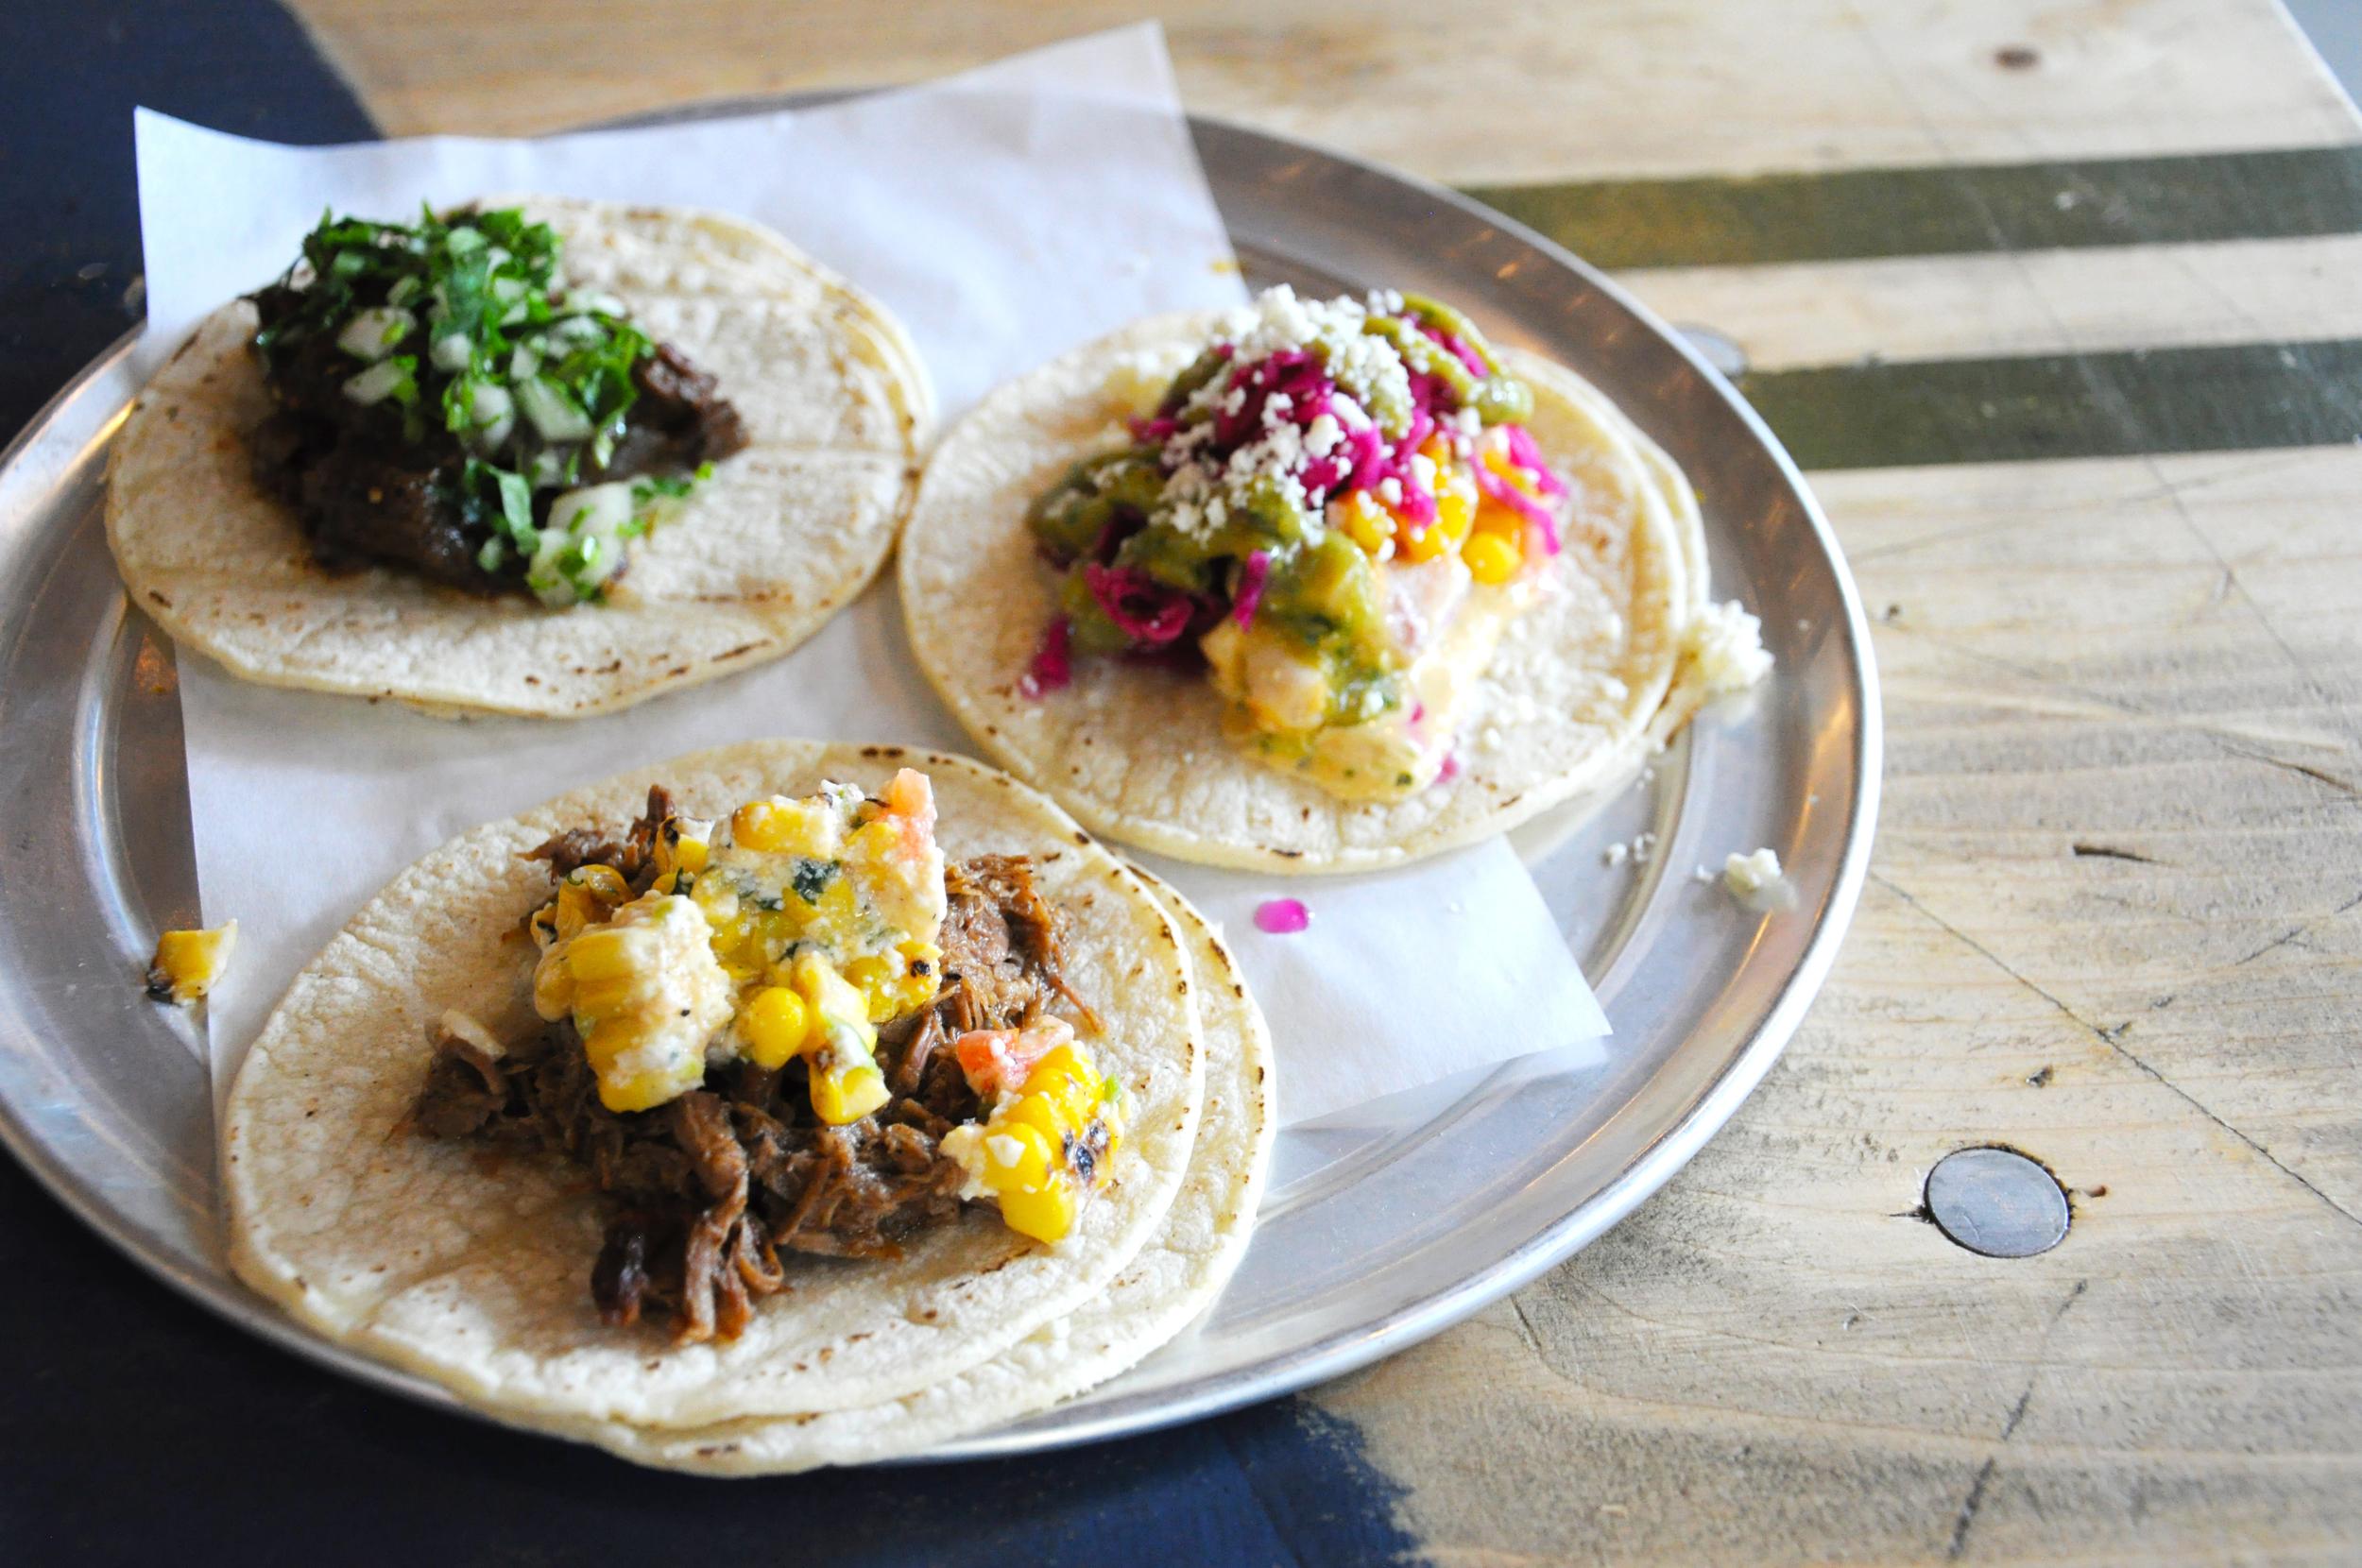 Tacos at Choza Taqueria inside Gotham West Market